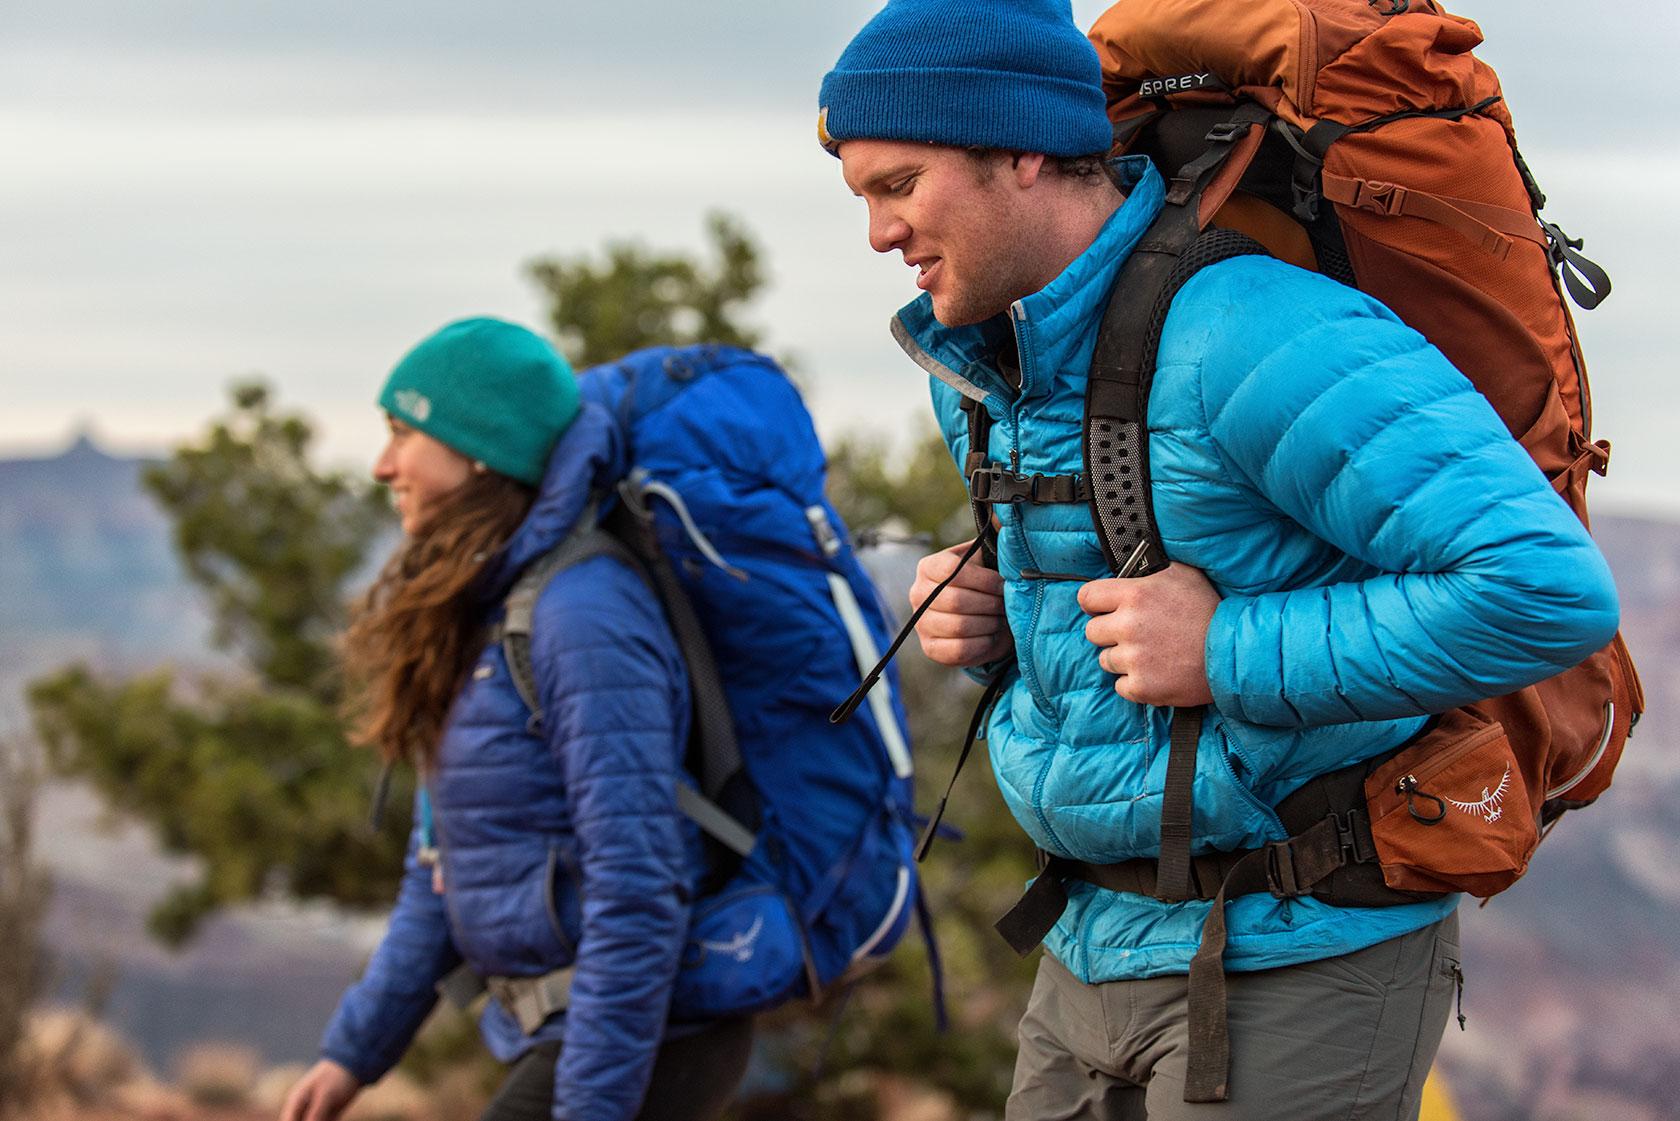 austin-trigg-osprey-hiking-backpacks-grand-canyon-osprey-pack-bag-arizona-hike-camp-lifestyle-couple-outdoor-adventure.jpg